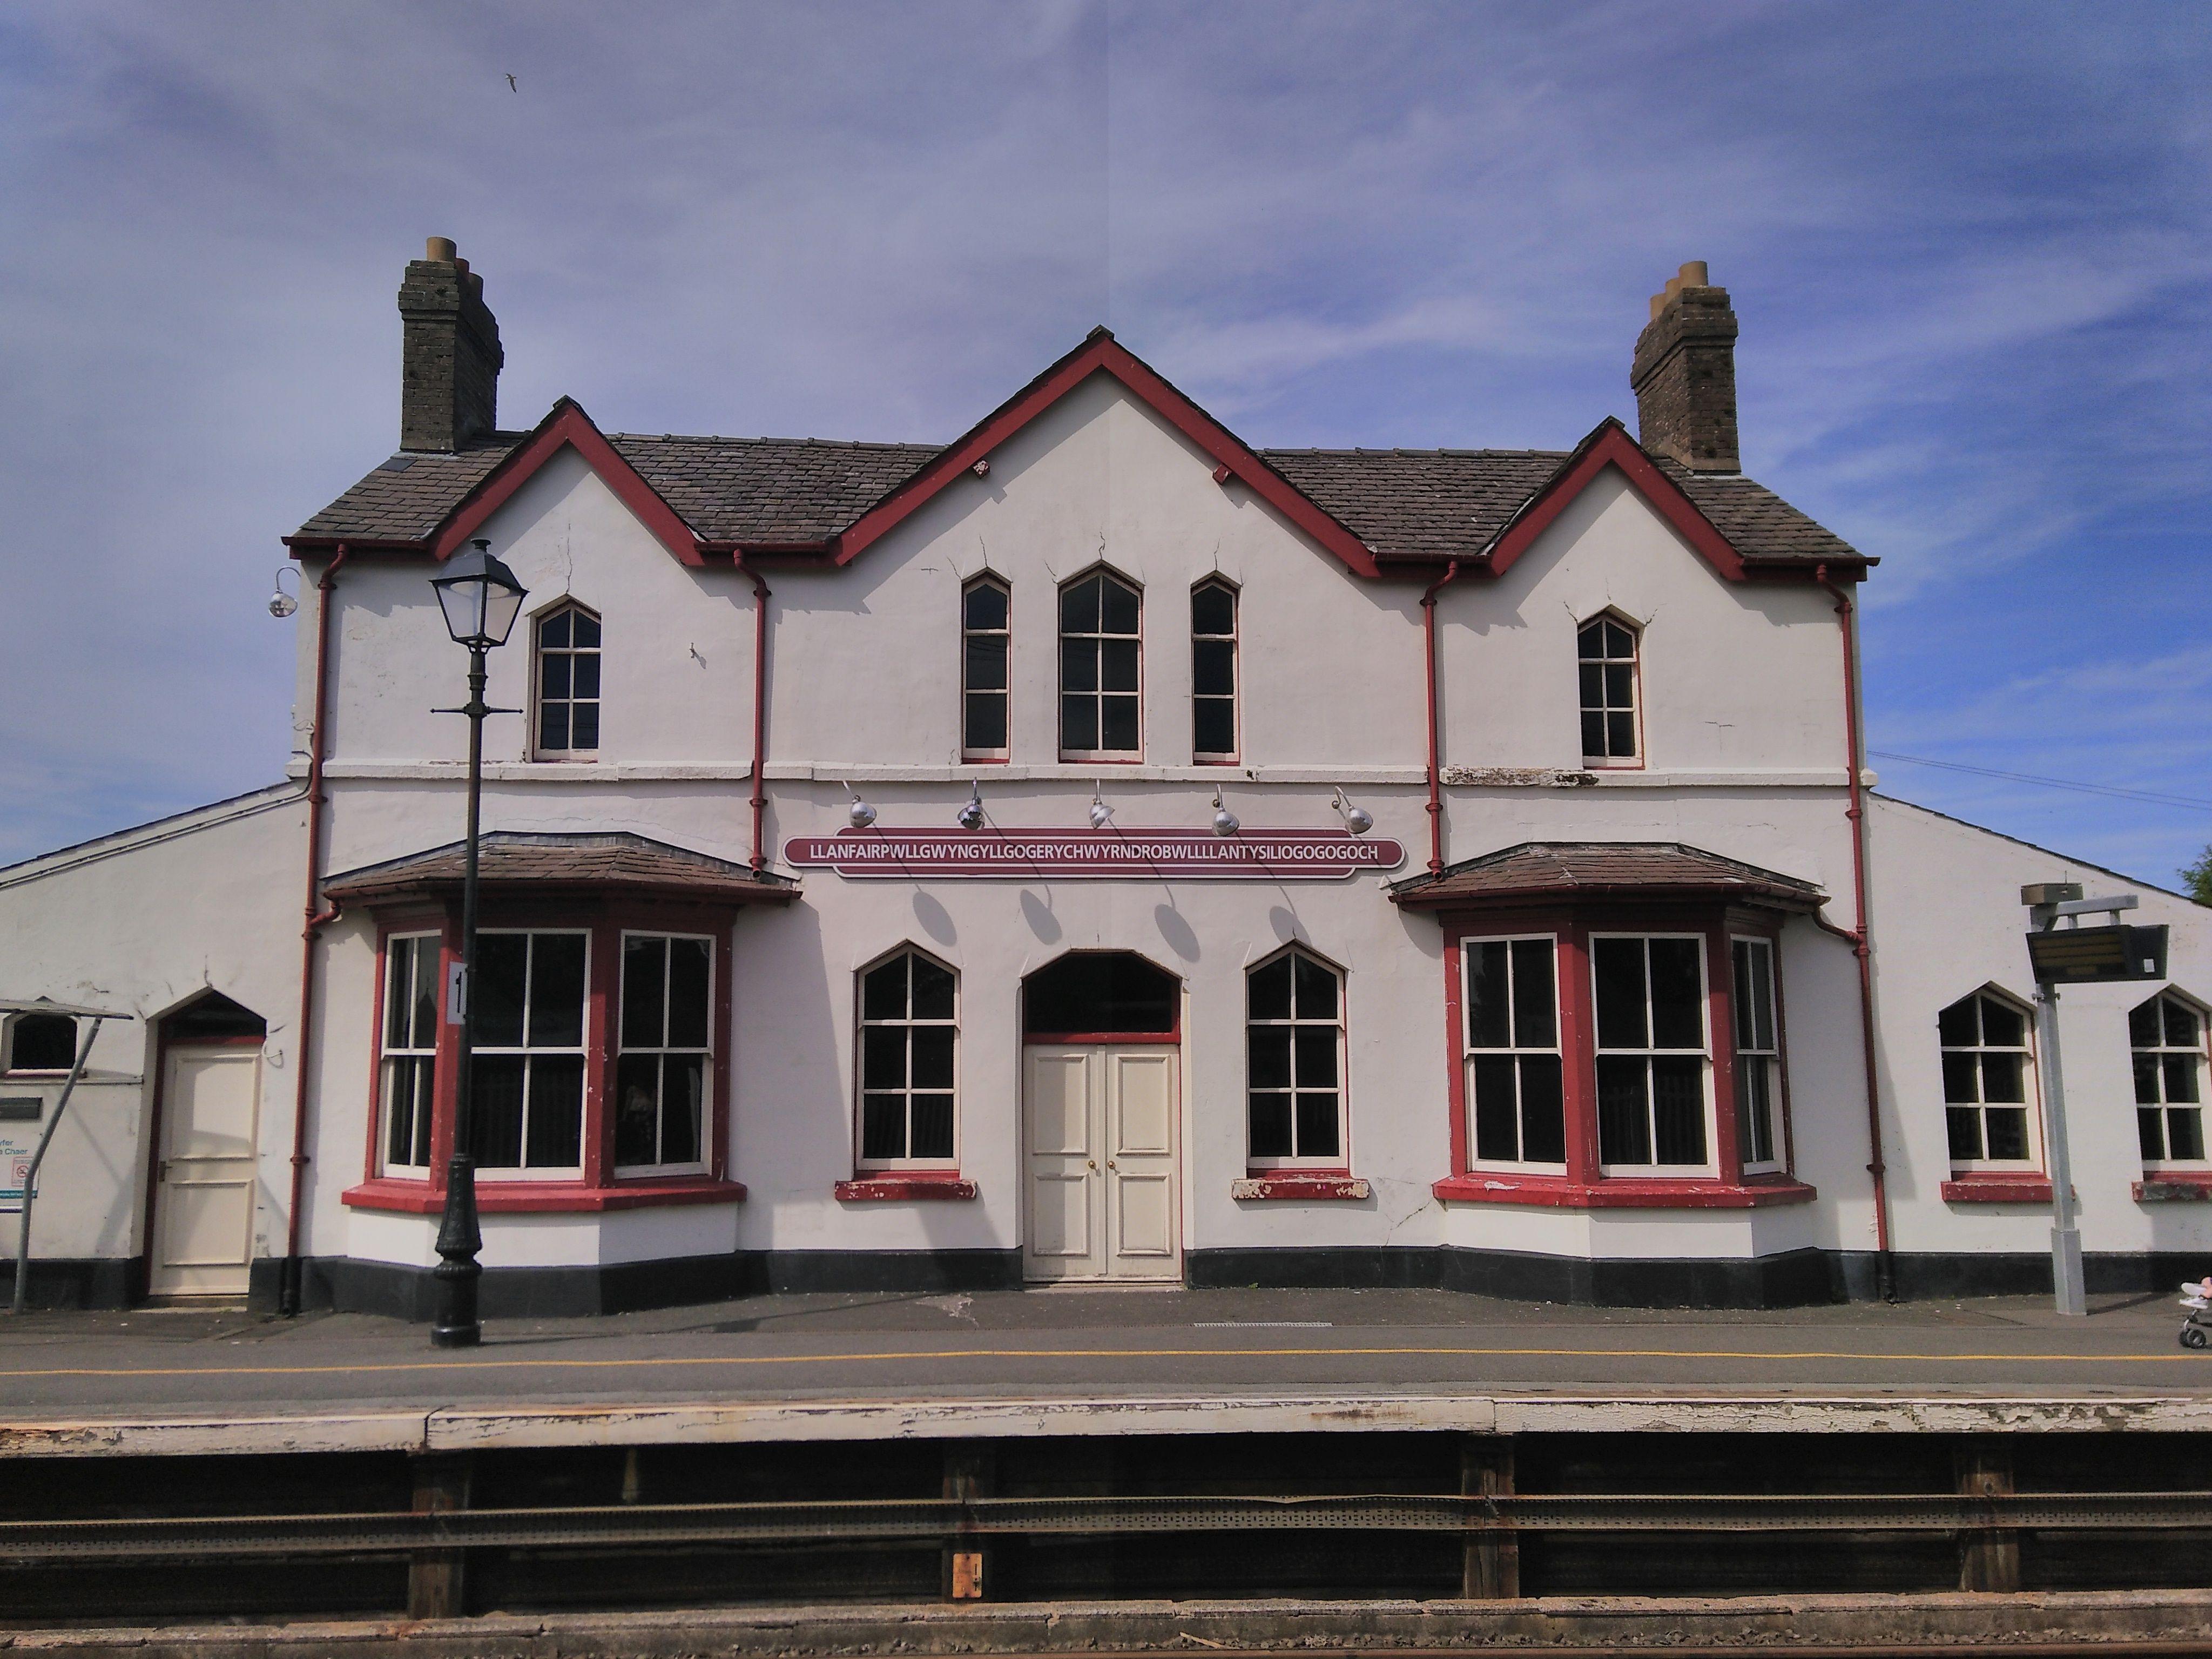 Llanfairpwllgwyngyll Is A Welsh Village On The Island Of